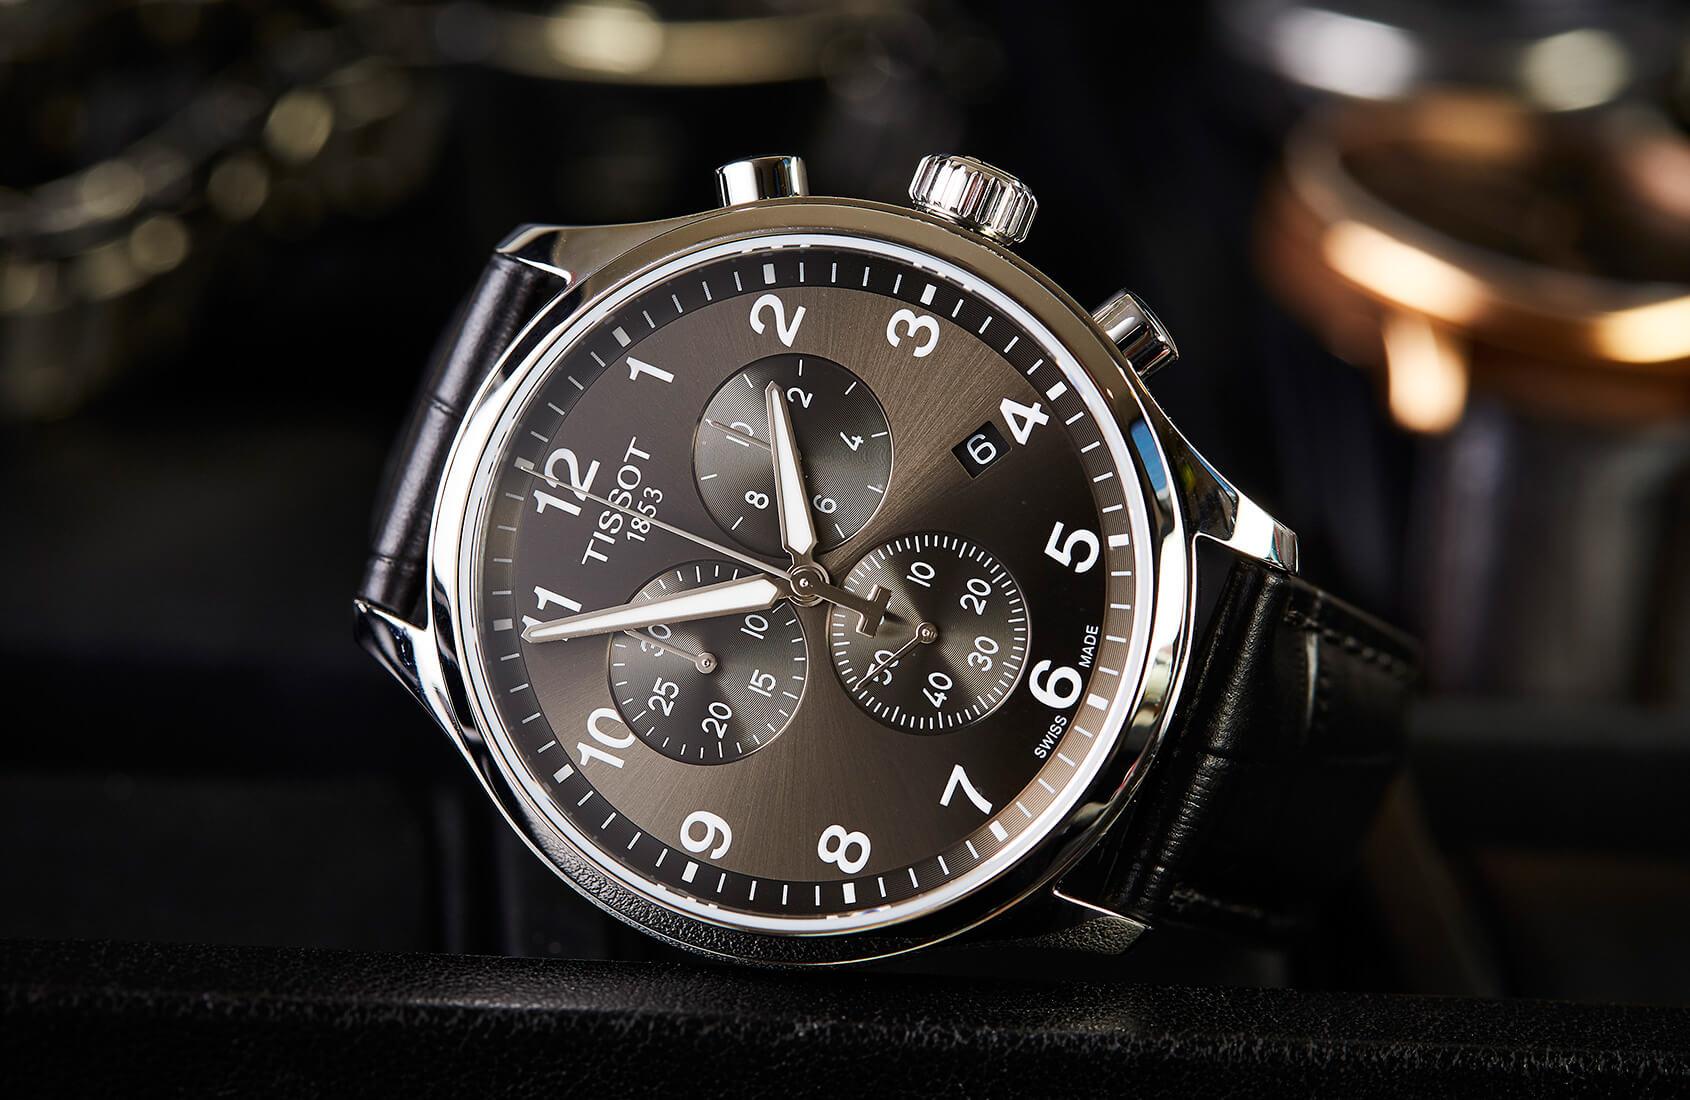 Tissot-Chrono-XL watch movements